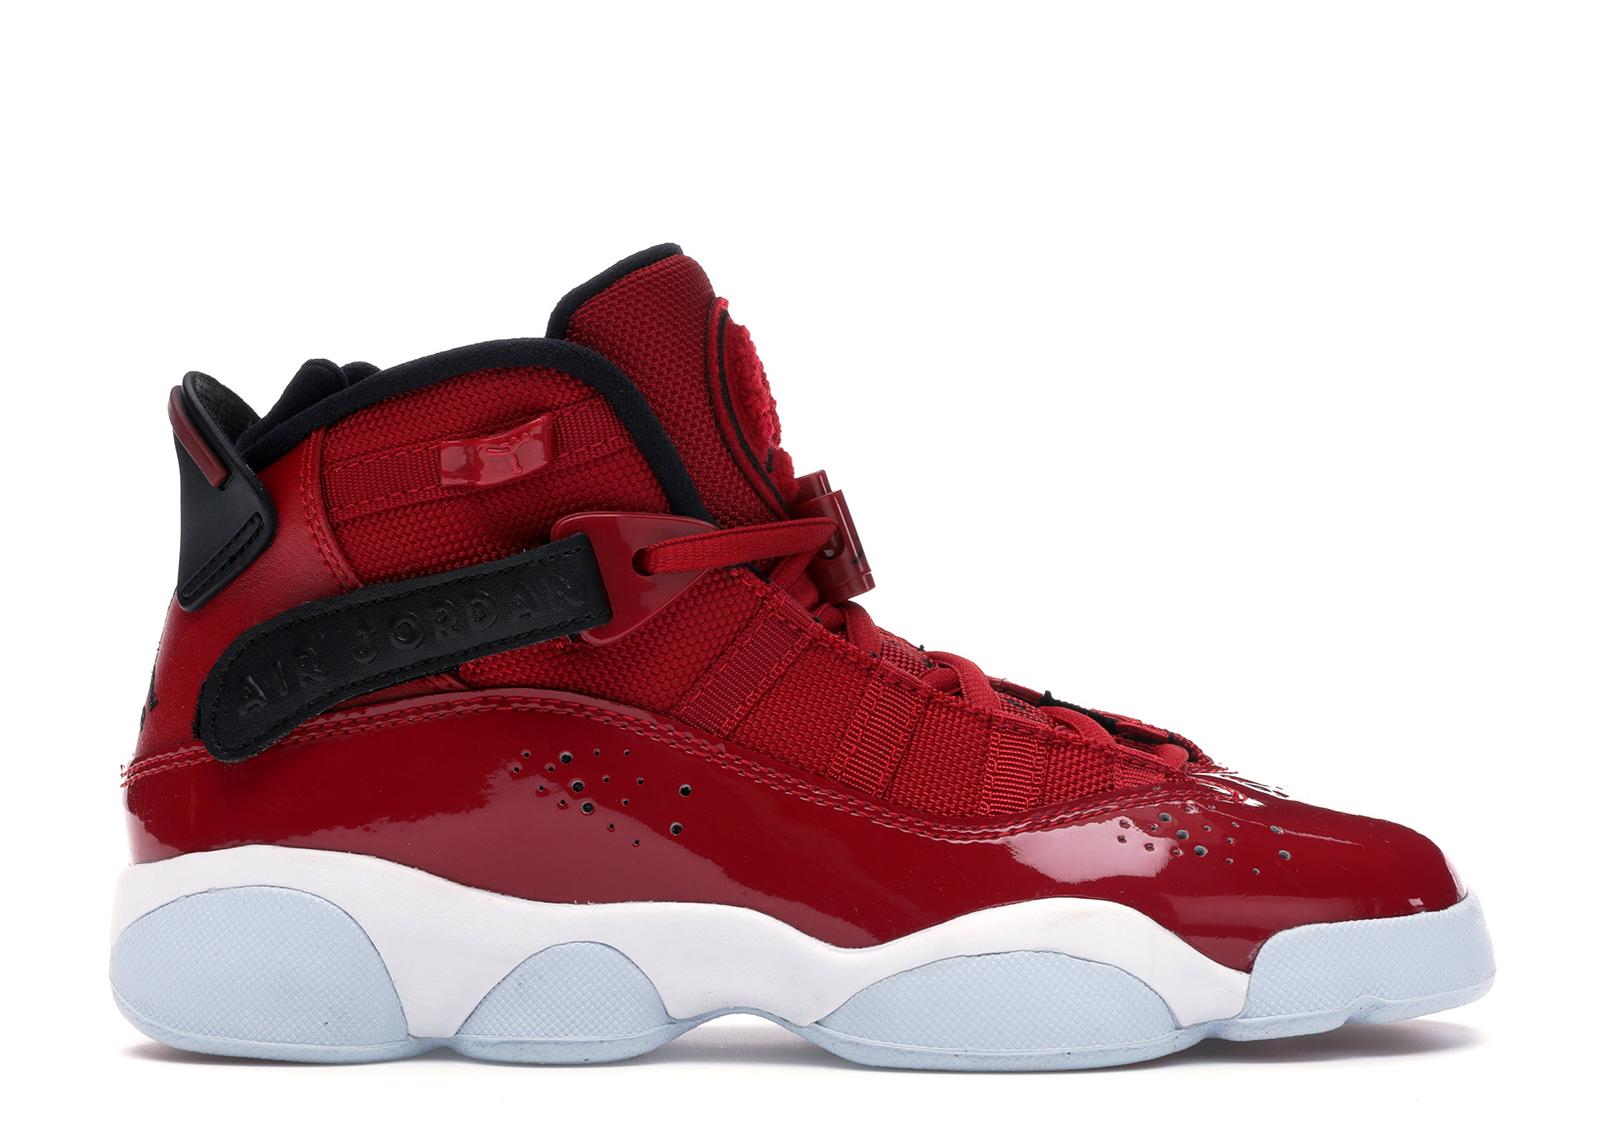 Jordan 6 Rings Gym Red (GS) - 323419-601